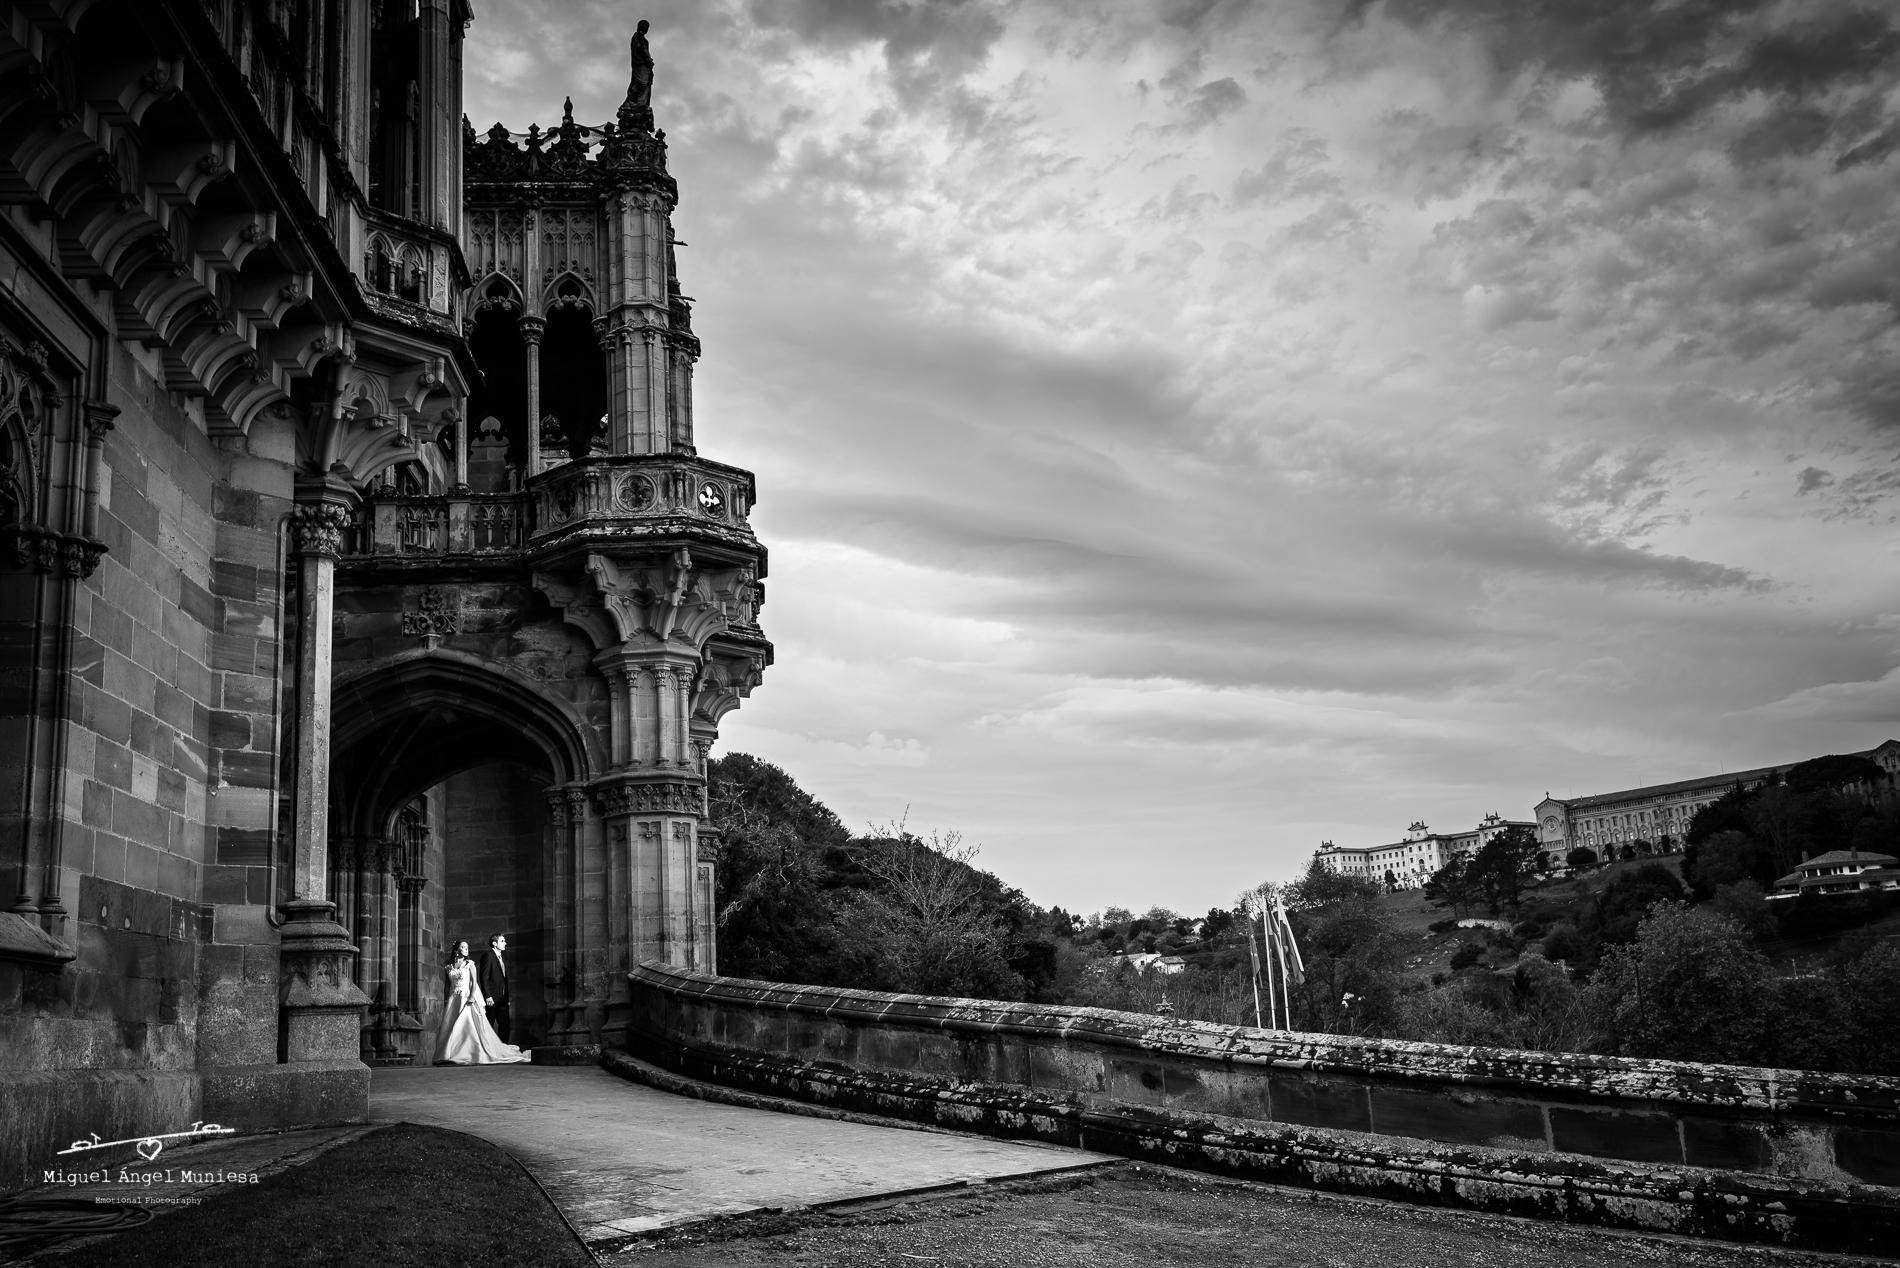 miguel angel muniesa, boda, fotografo de boda, boda zaragoza, wedding photographer, miguel angel muniesa emotional photography, destination wedding_04